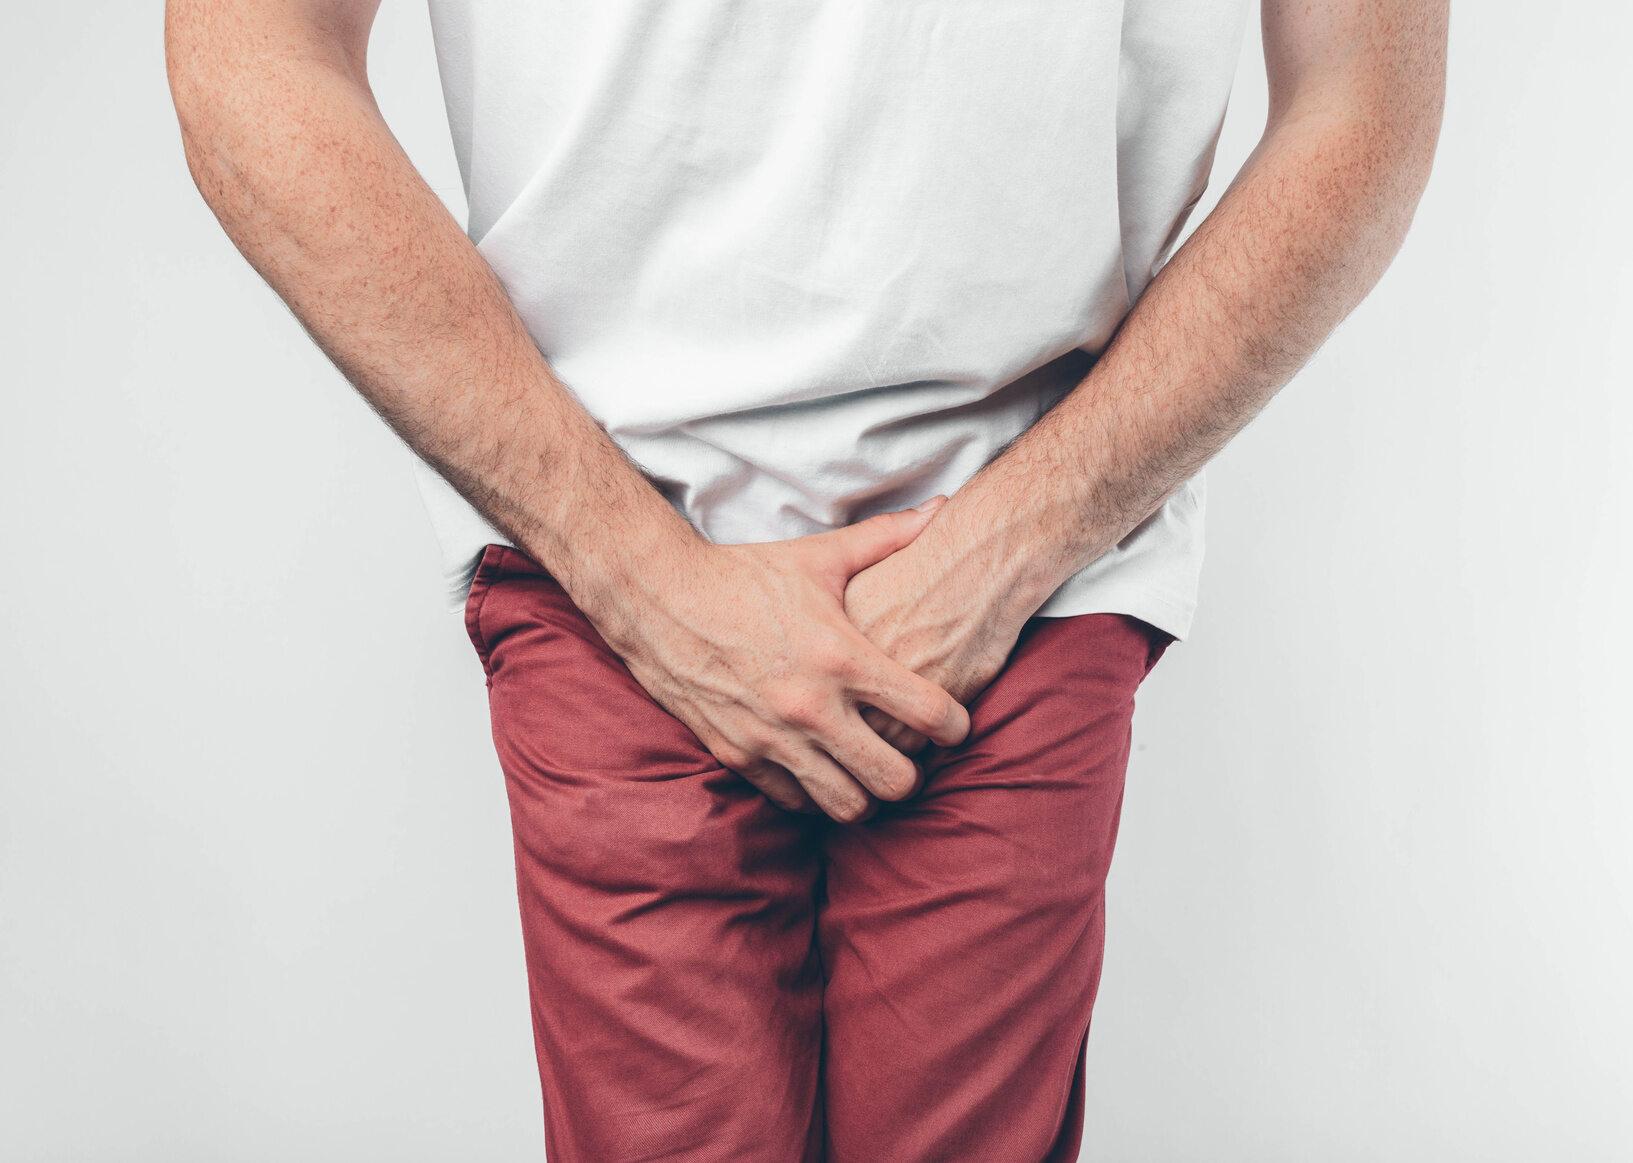 prostata objawy raka